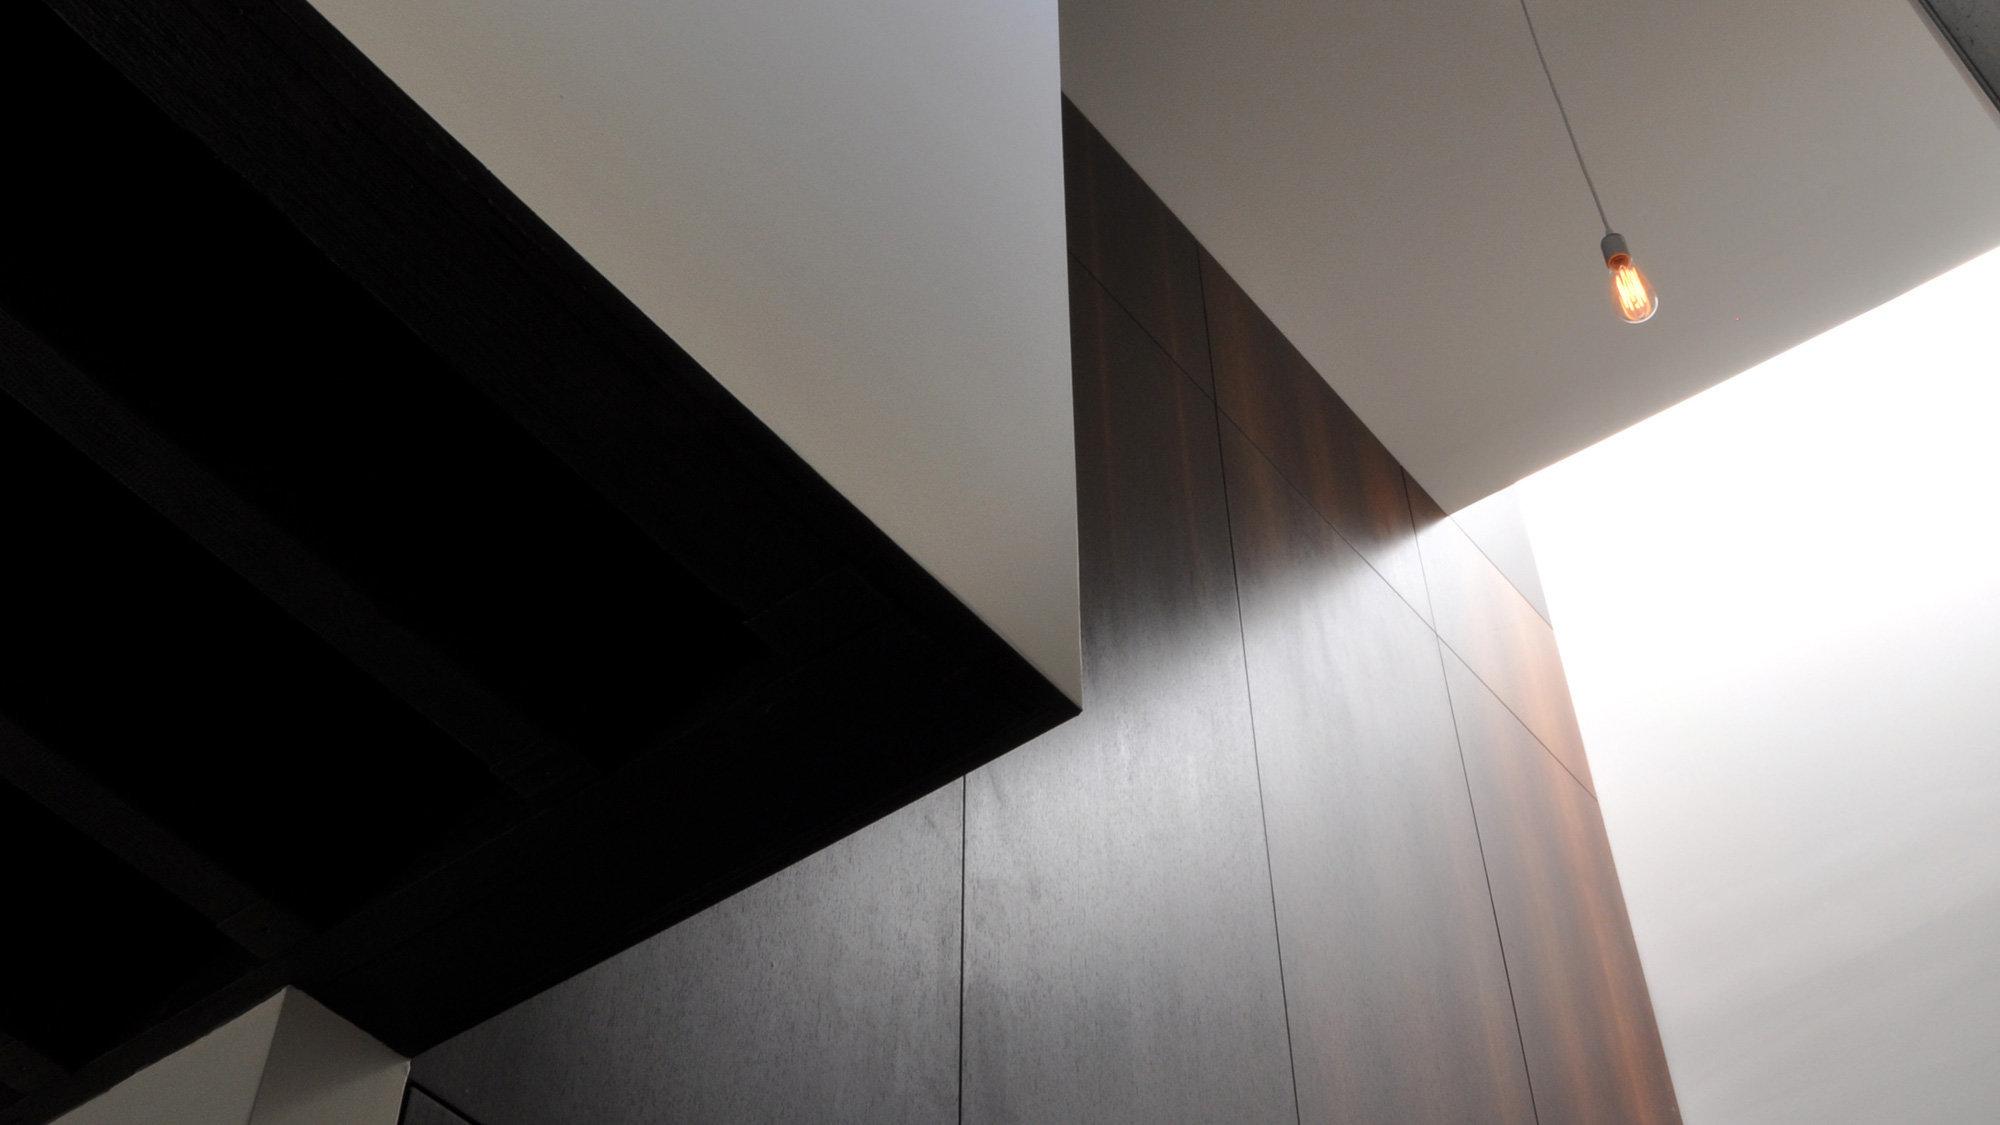 skylight2.jpg